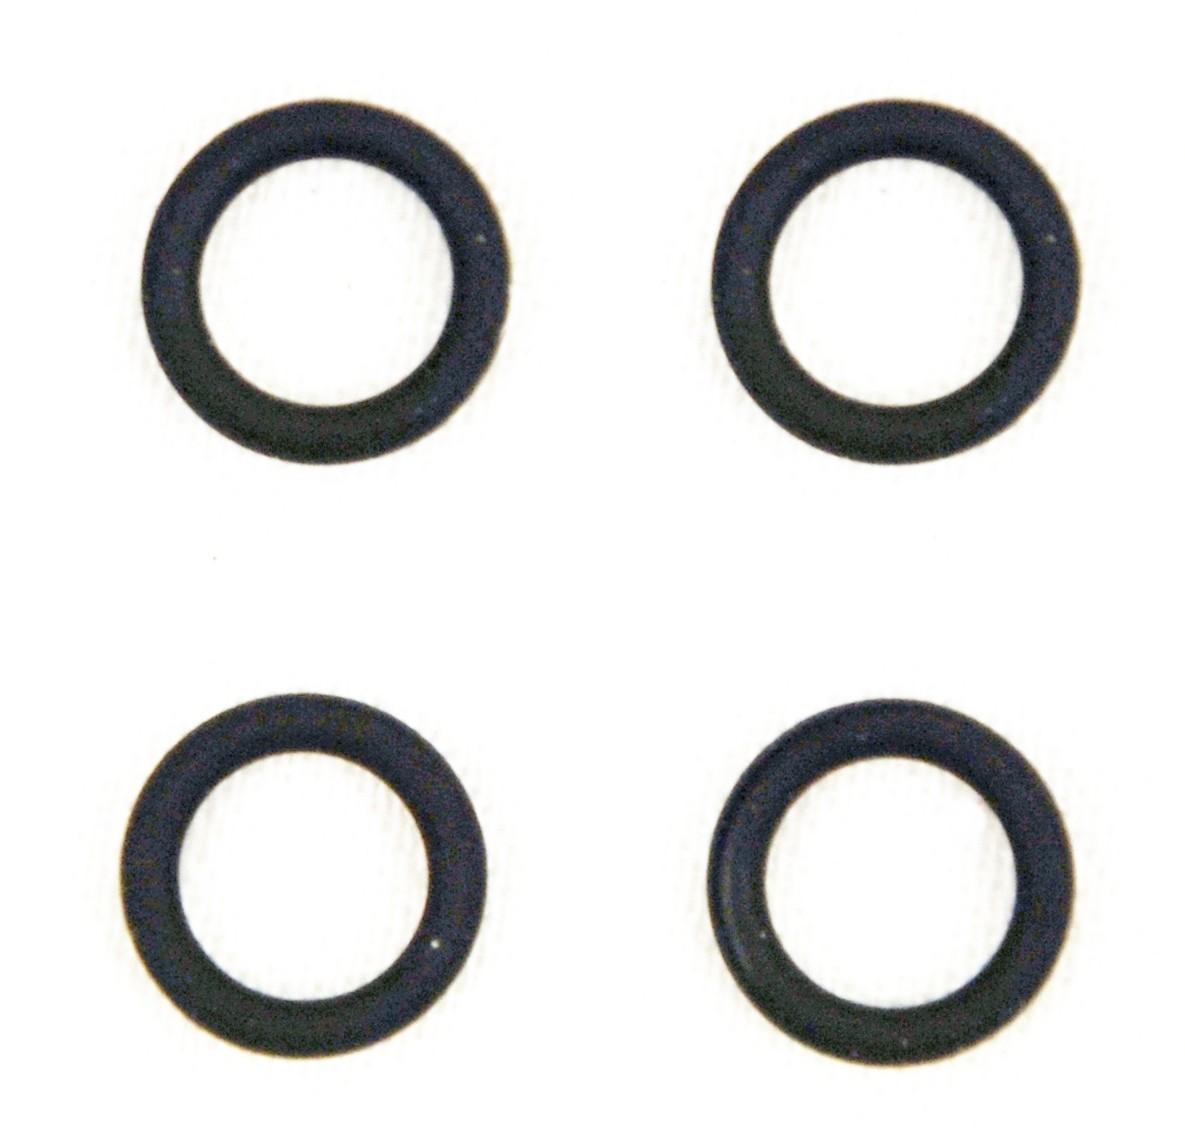 magnum fuel injector o ring set fits 1979 2006 toyota camry corolla pickup magn ebay. Black Bedroom Furniture Sets. Home Design Ideas